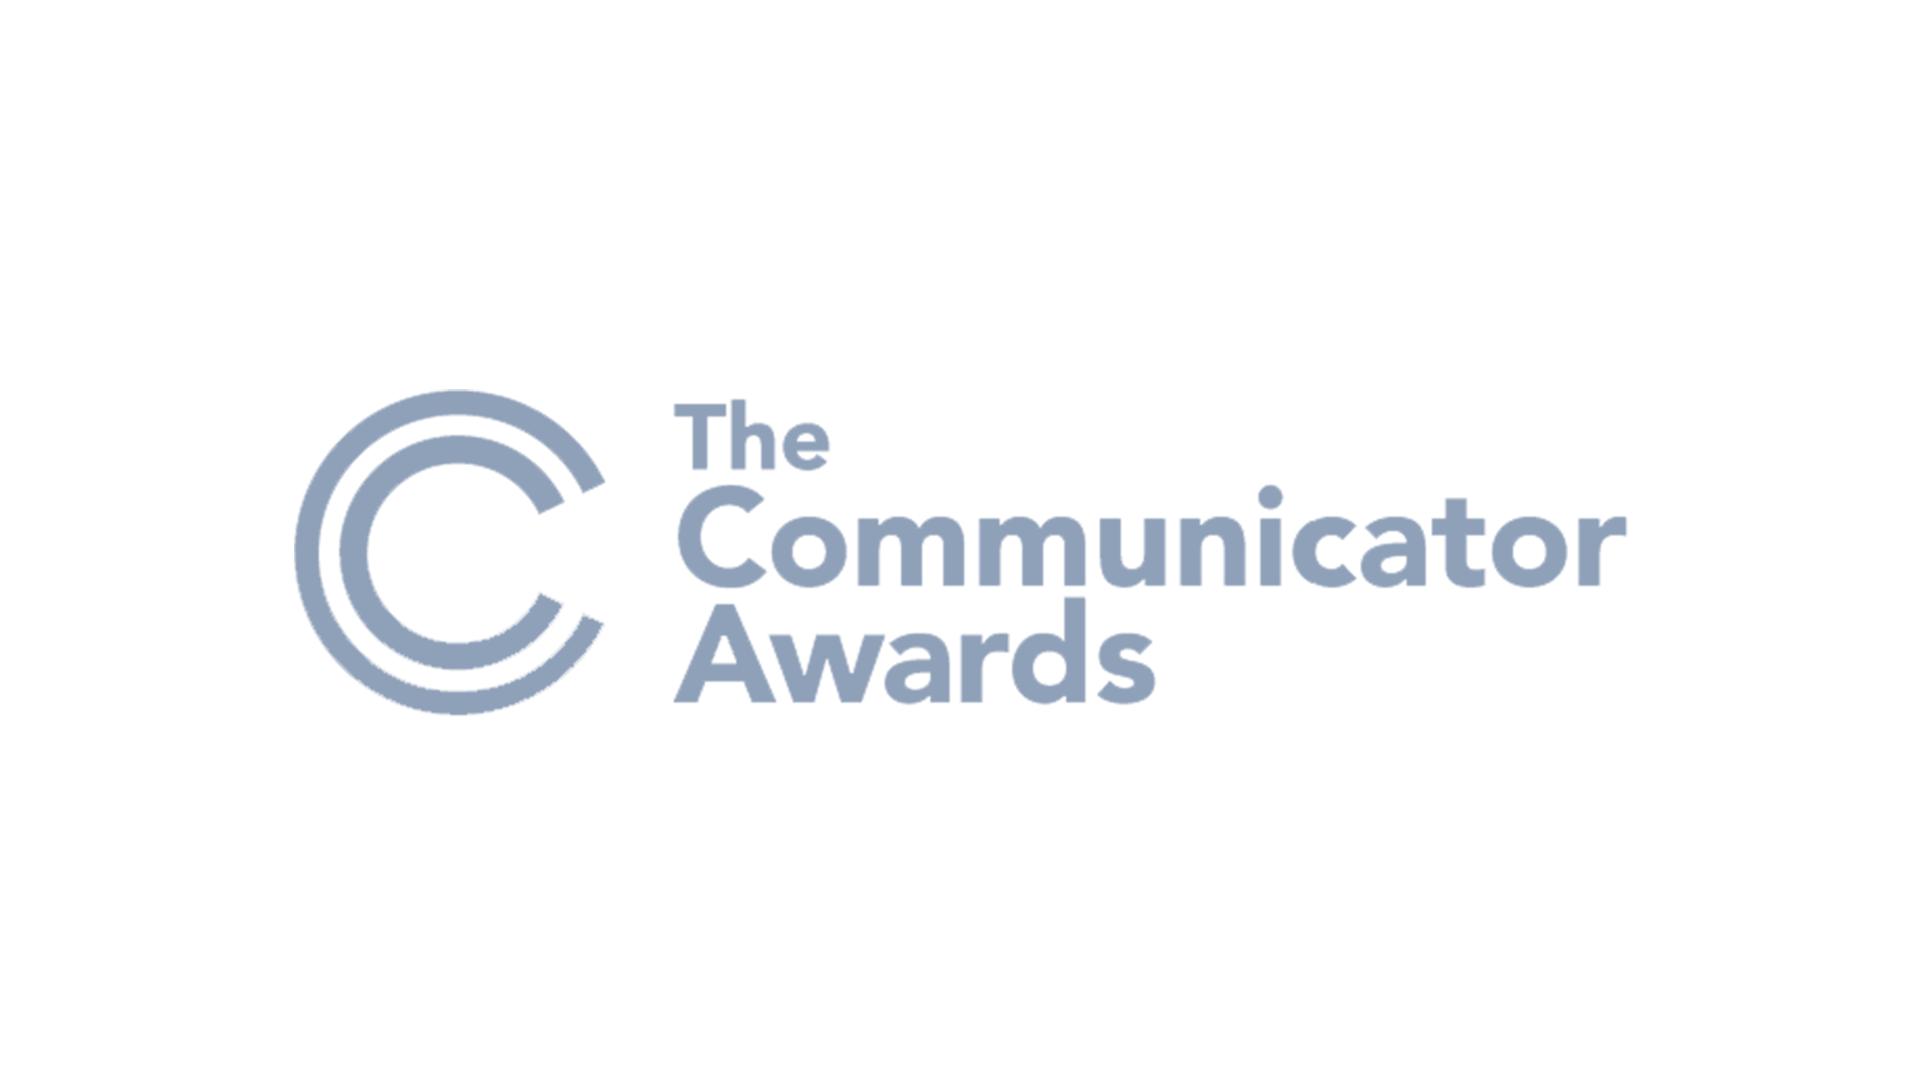 awards_logo_03